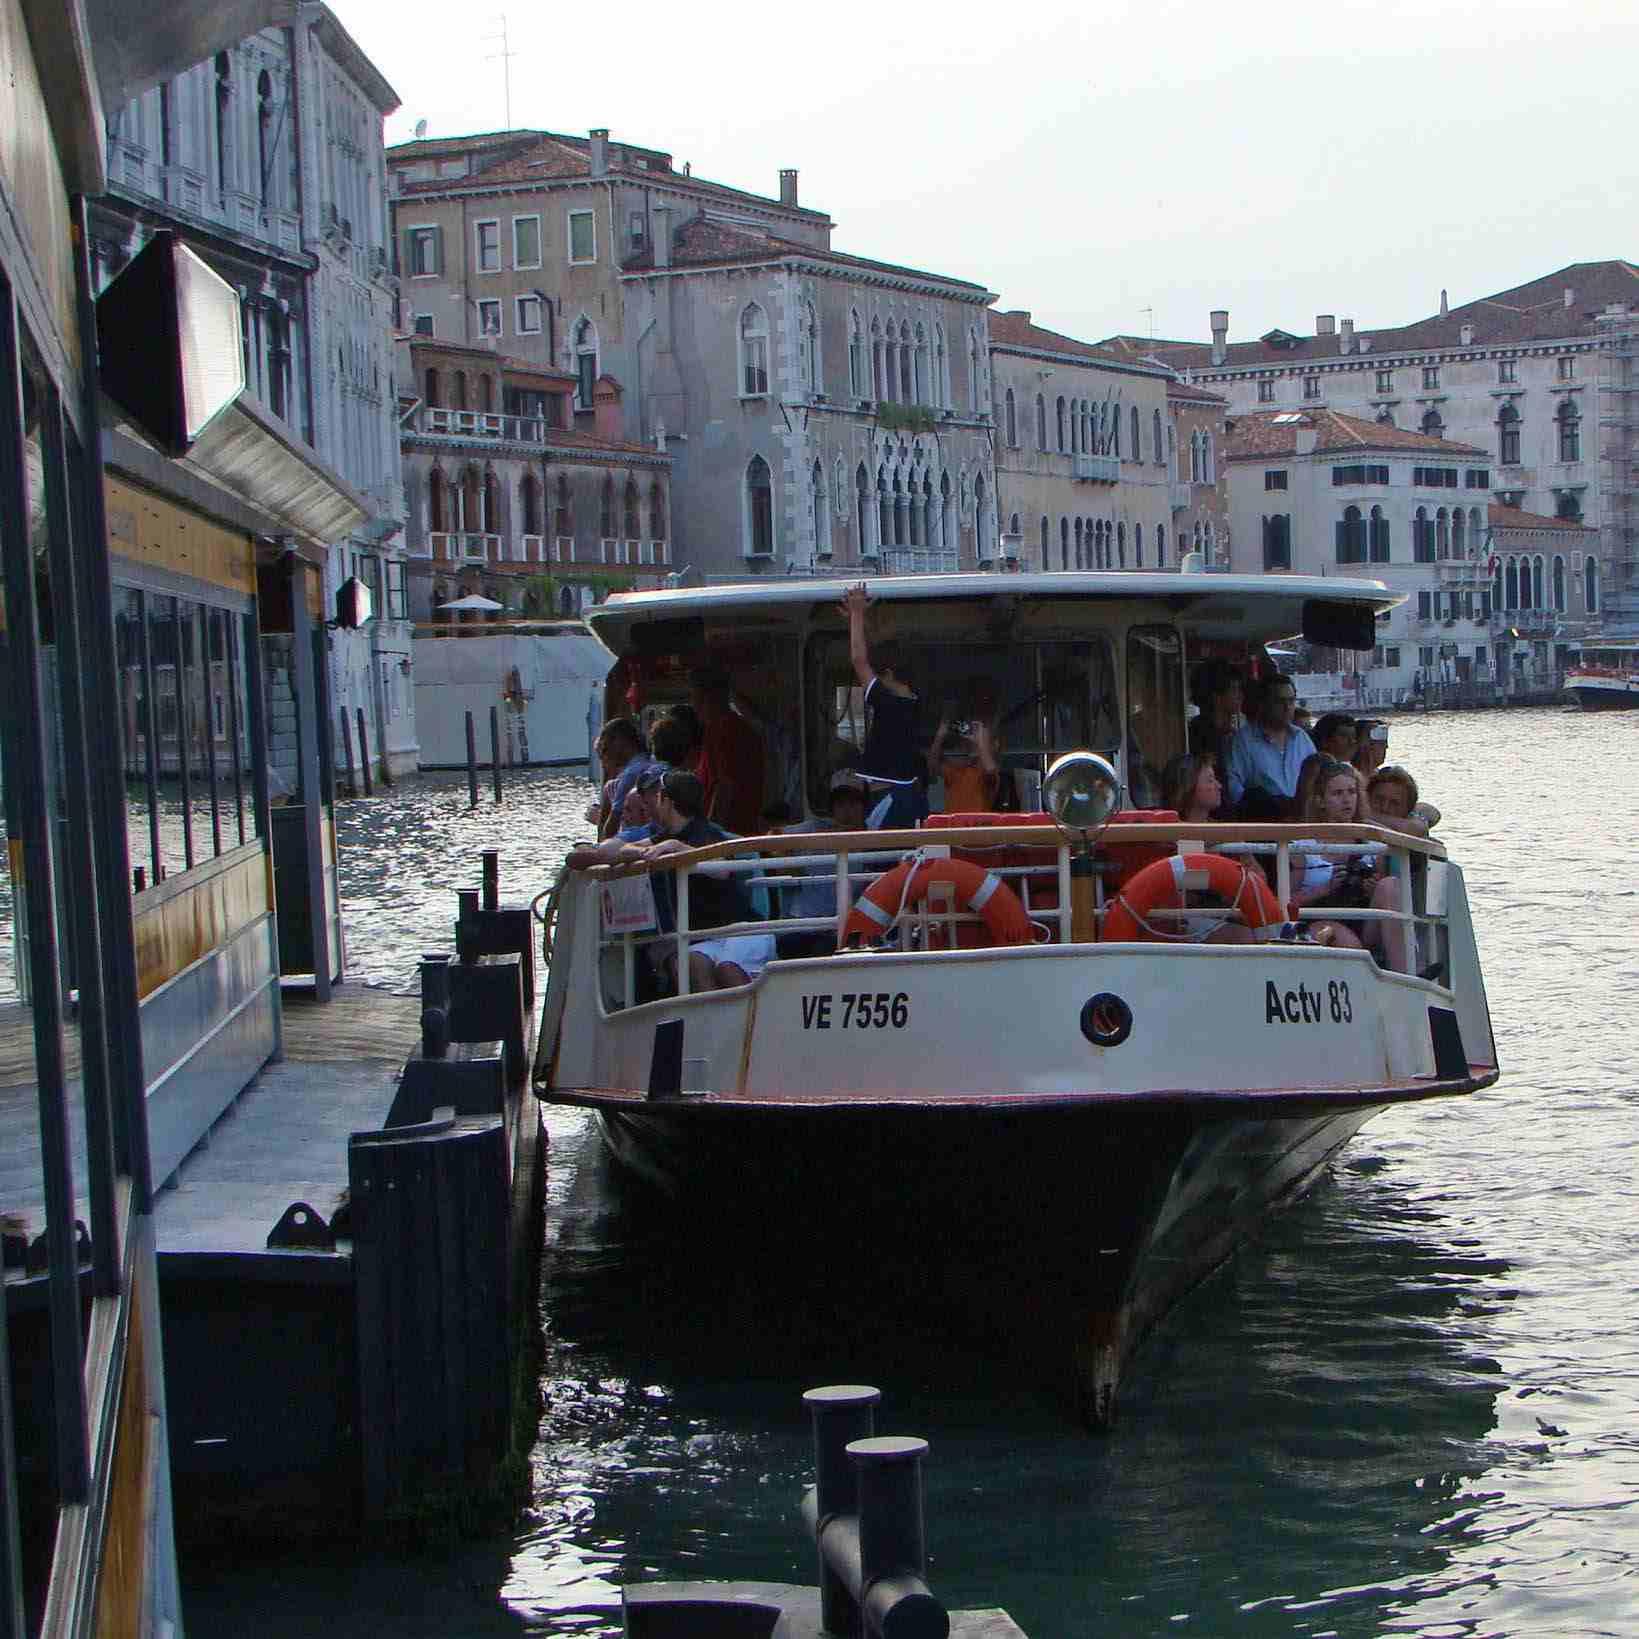 Vaporetto rides are a preferred method of transportation in Venice, Italy.